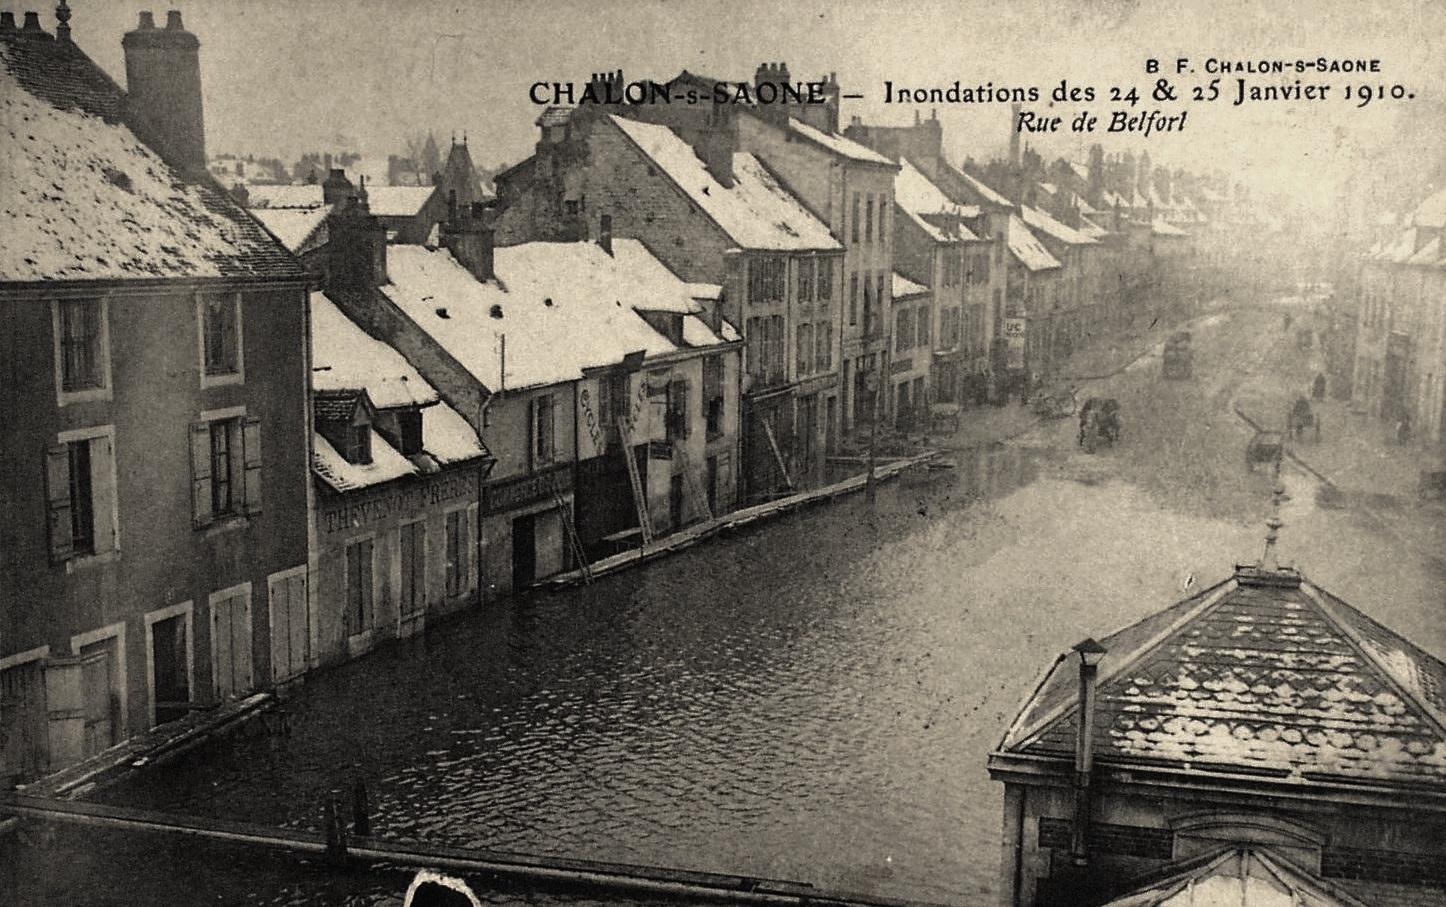 Chalon-sur-Saône (71) Inondations 1910 CPA